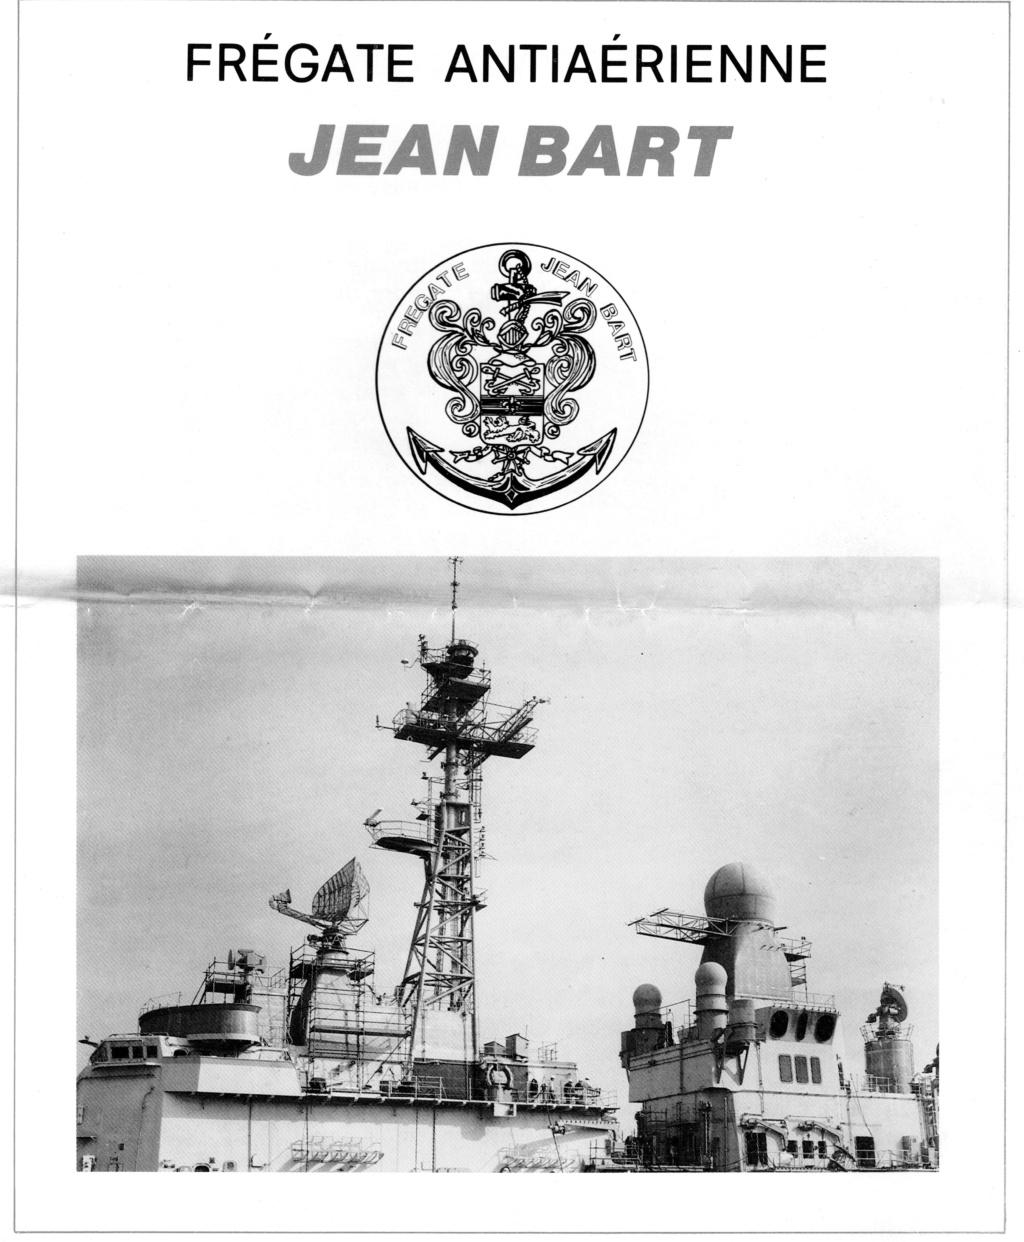 JEAN BART (FRÉGATE) - Page 6 Jean_b11